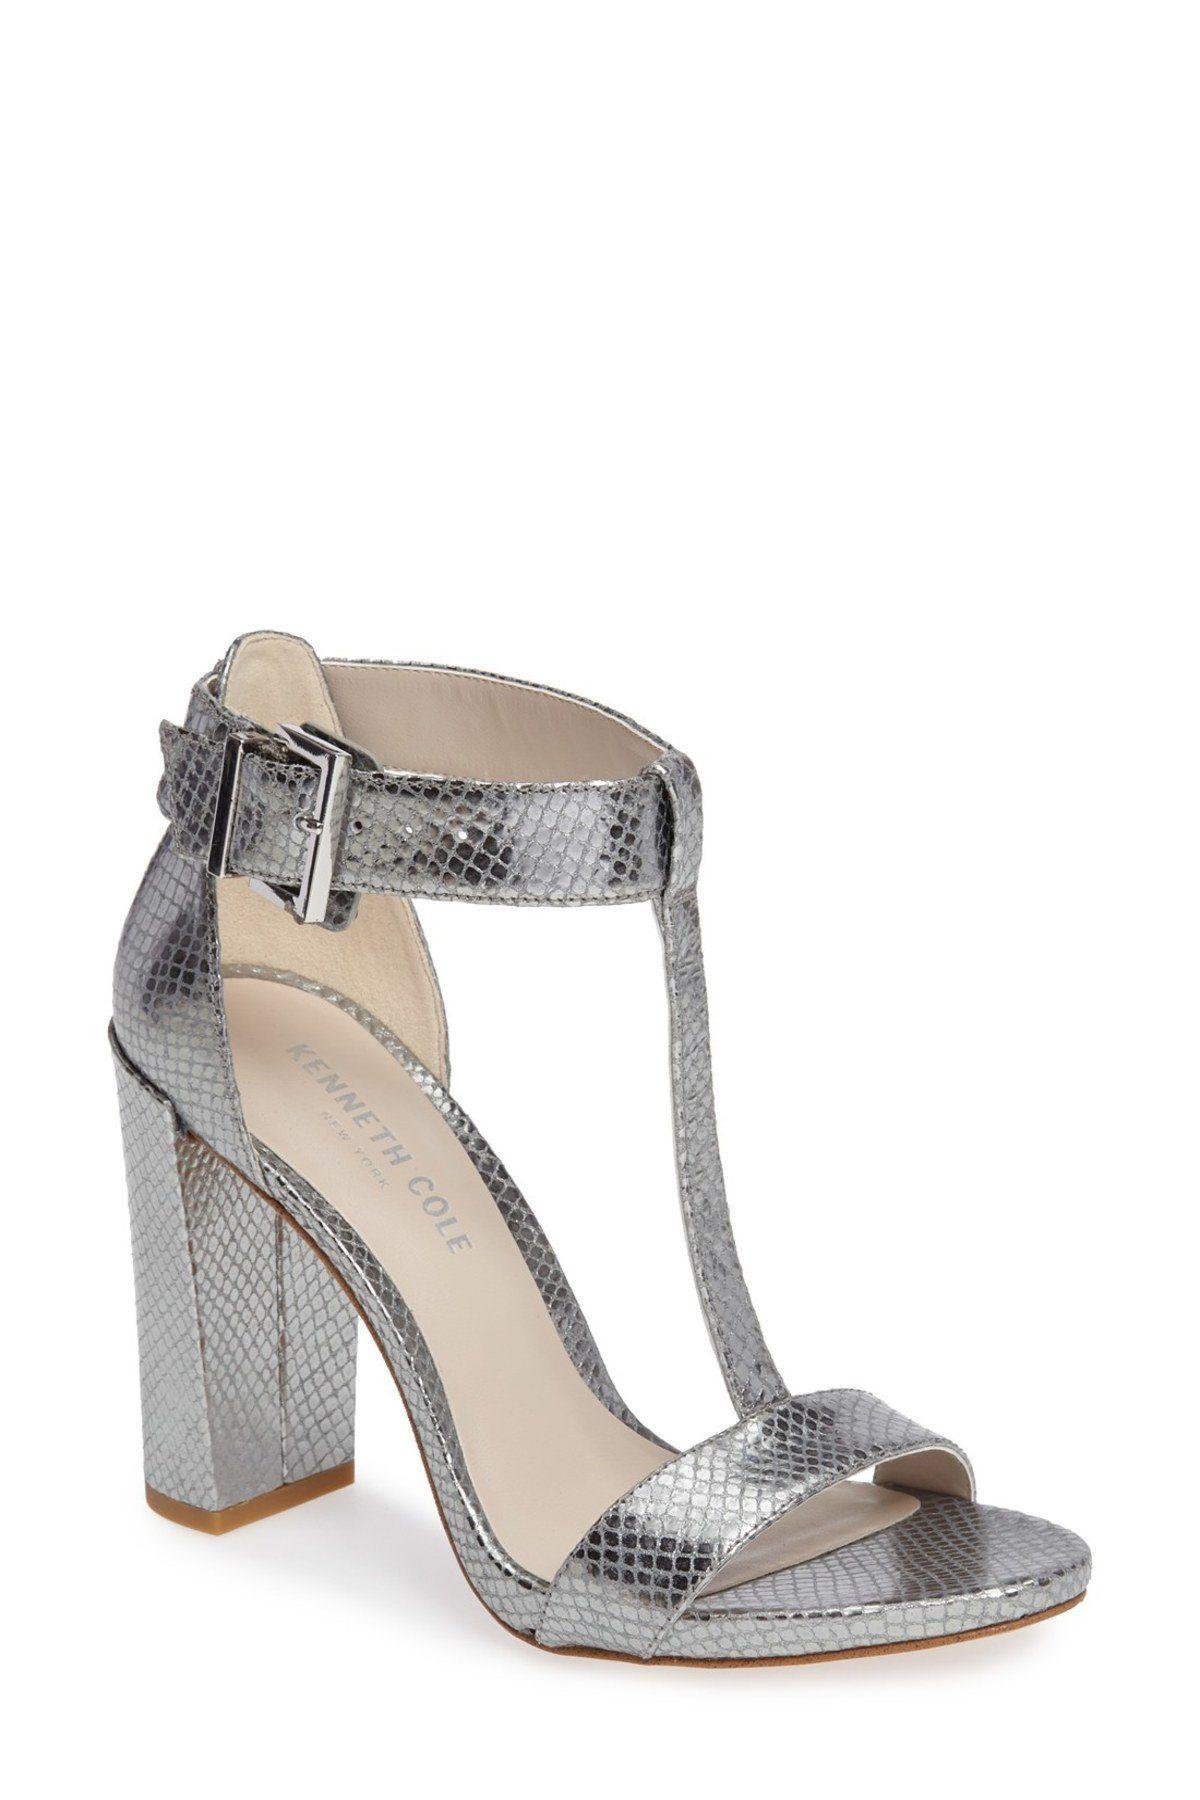 11e266af7058 Daisy Snake Embossed T-Strap Sandal